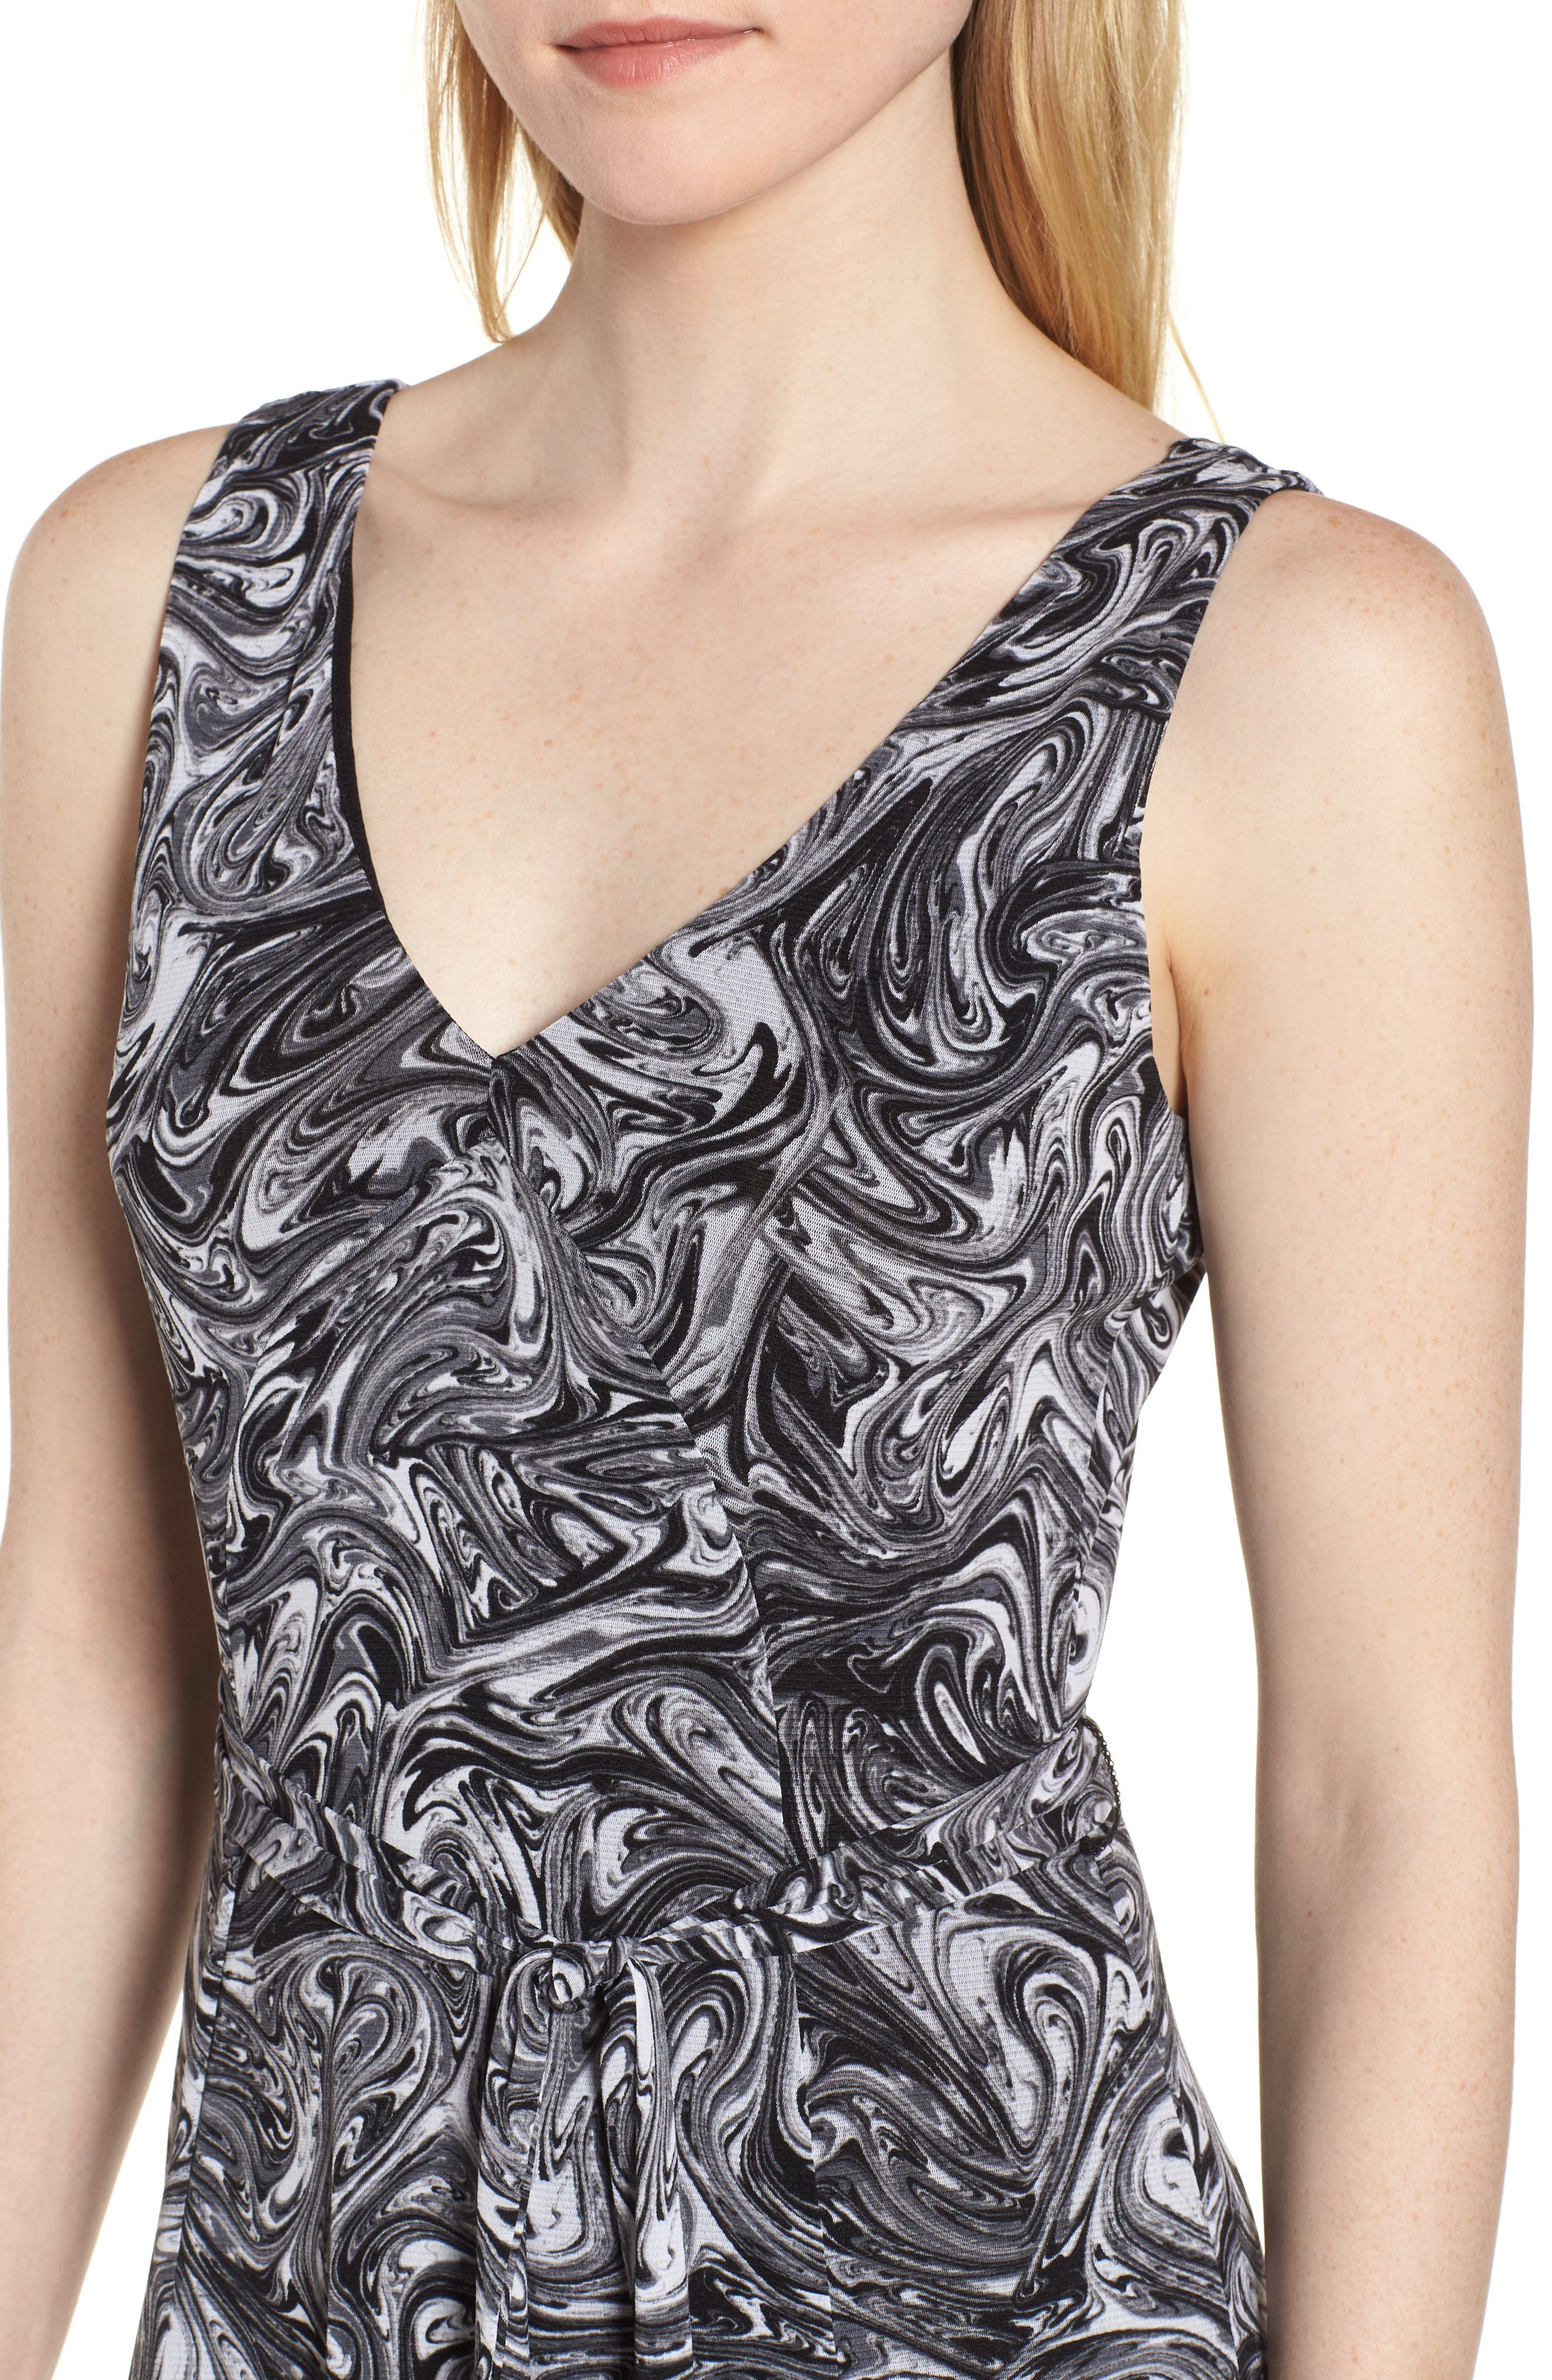 Watermark Swirl Flare Tank Dress,                             Alternate thumbnail 4, color,                             001